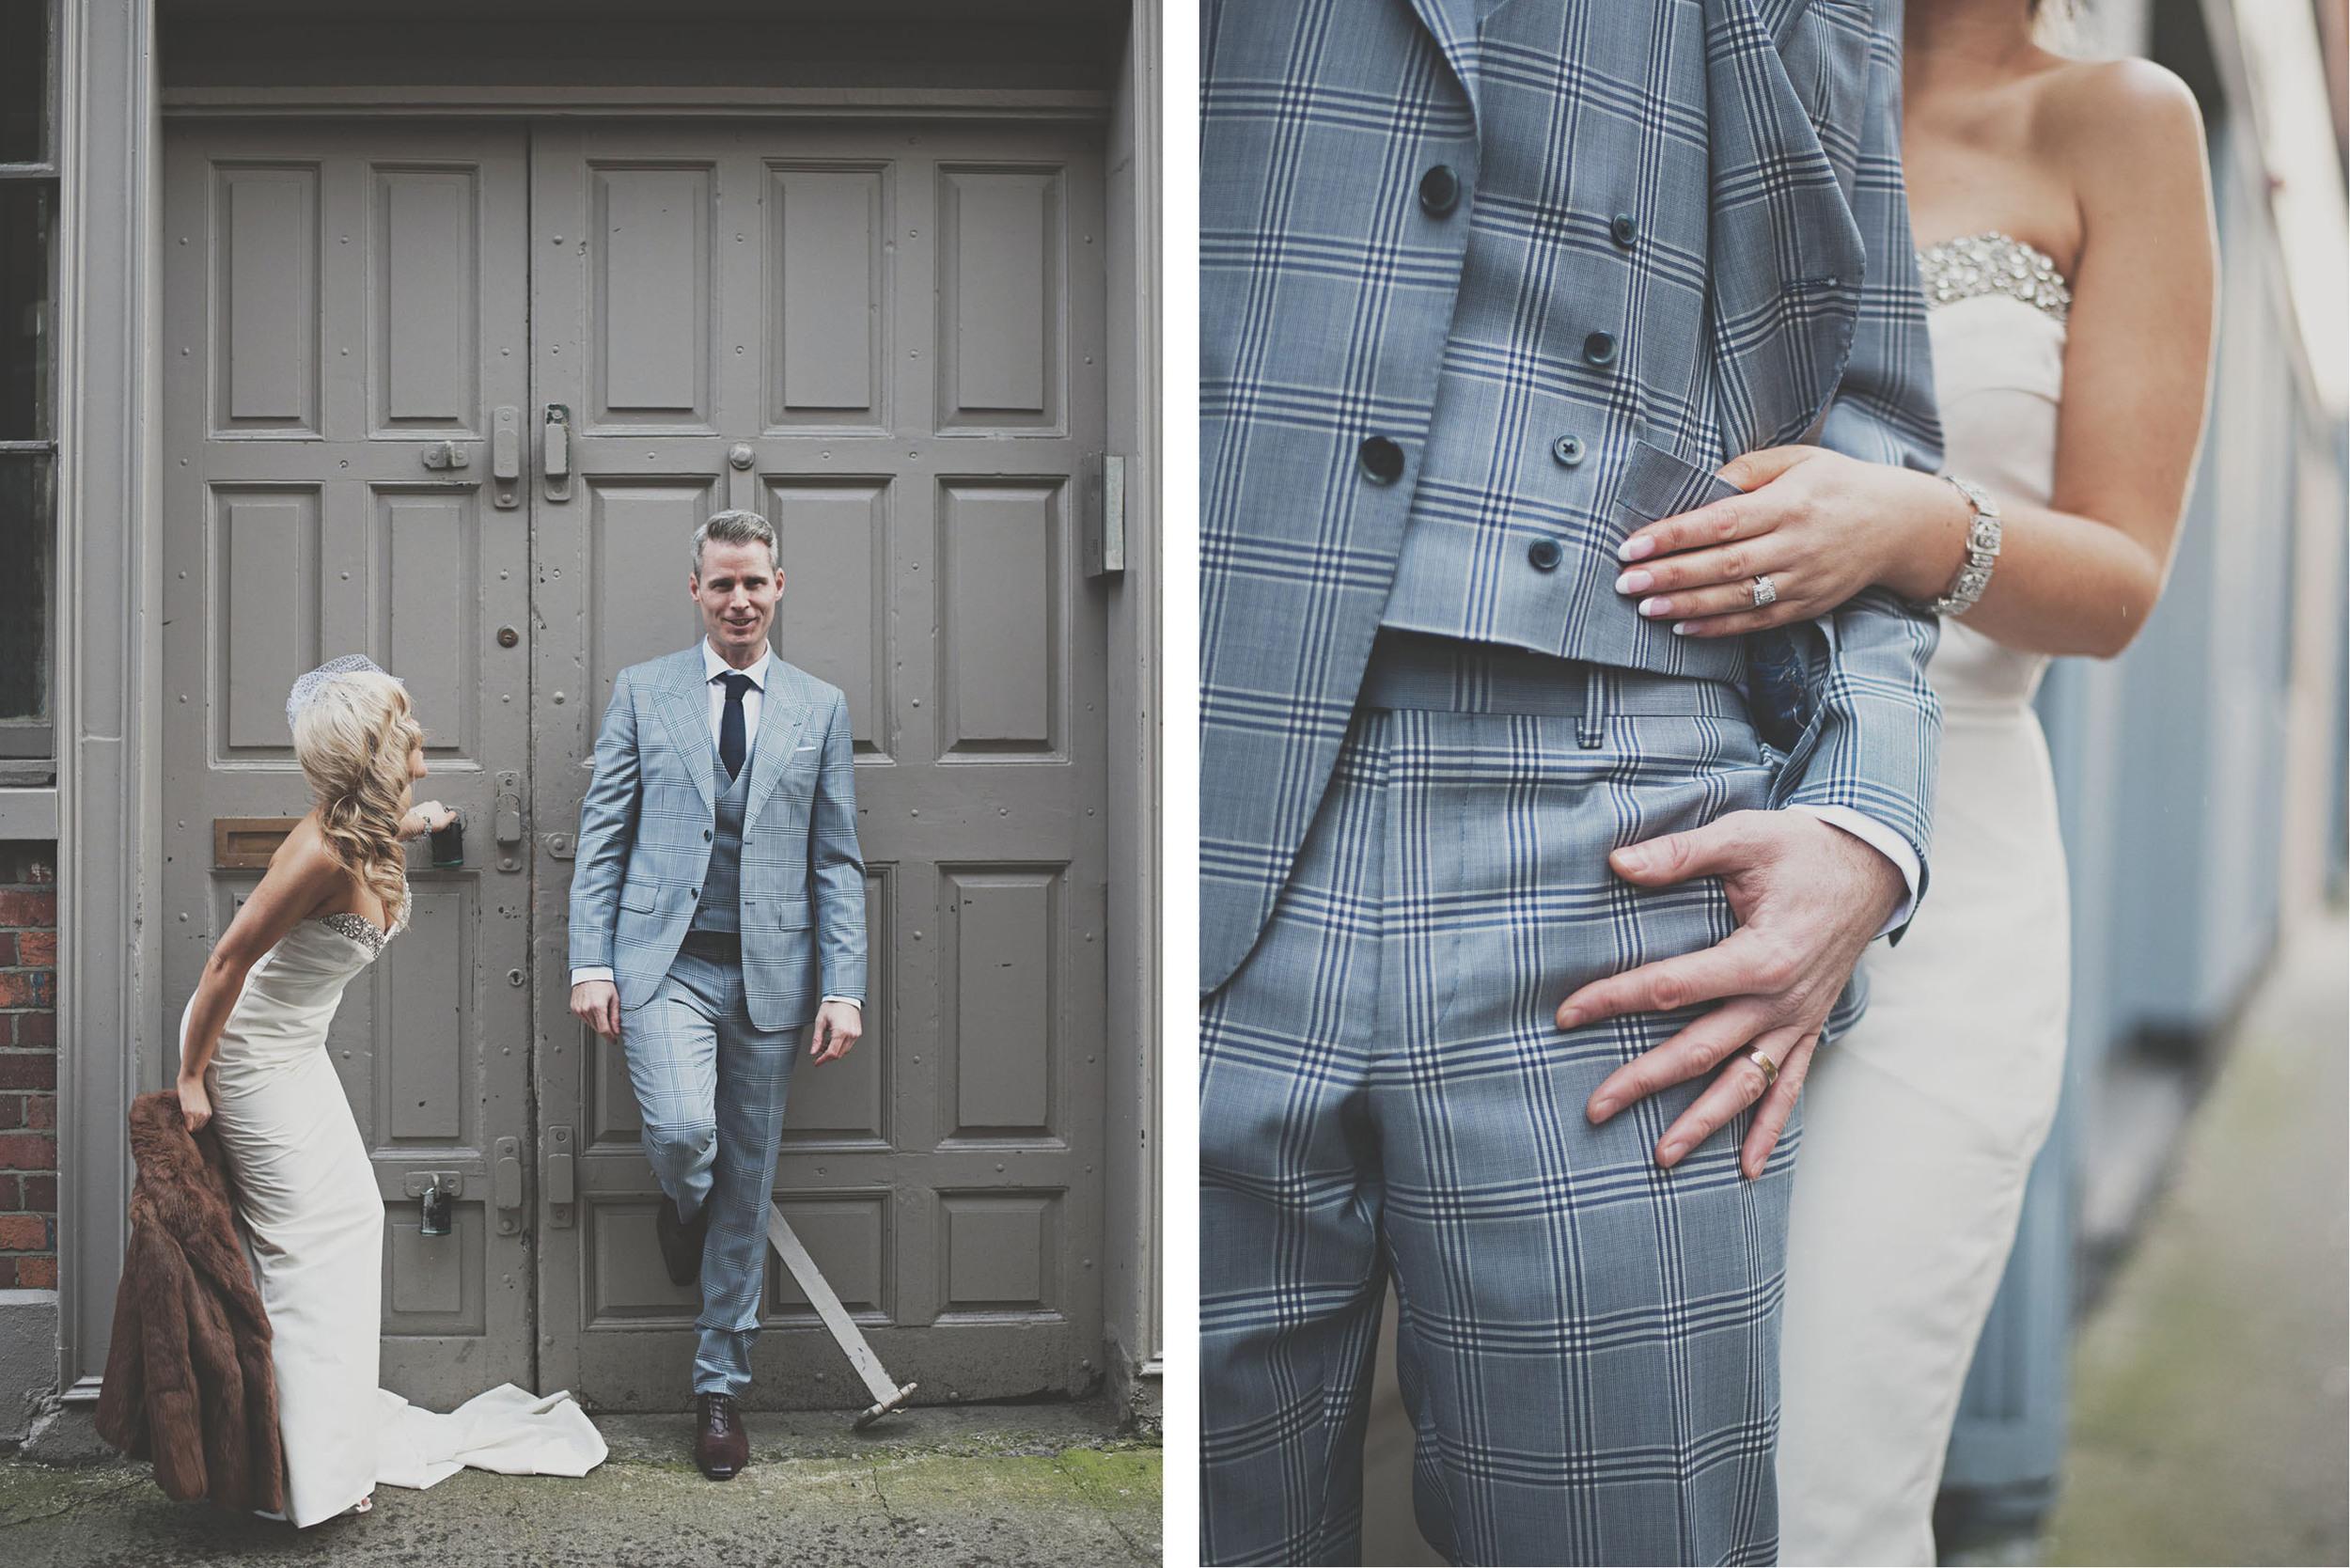 Capturing moments, Irish wedding photographers